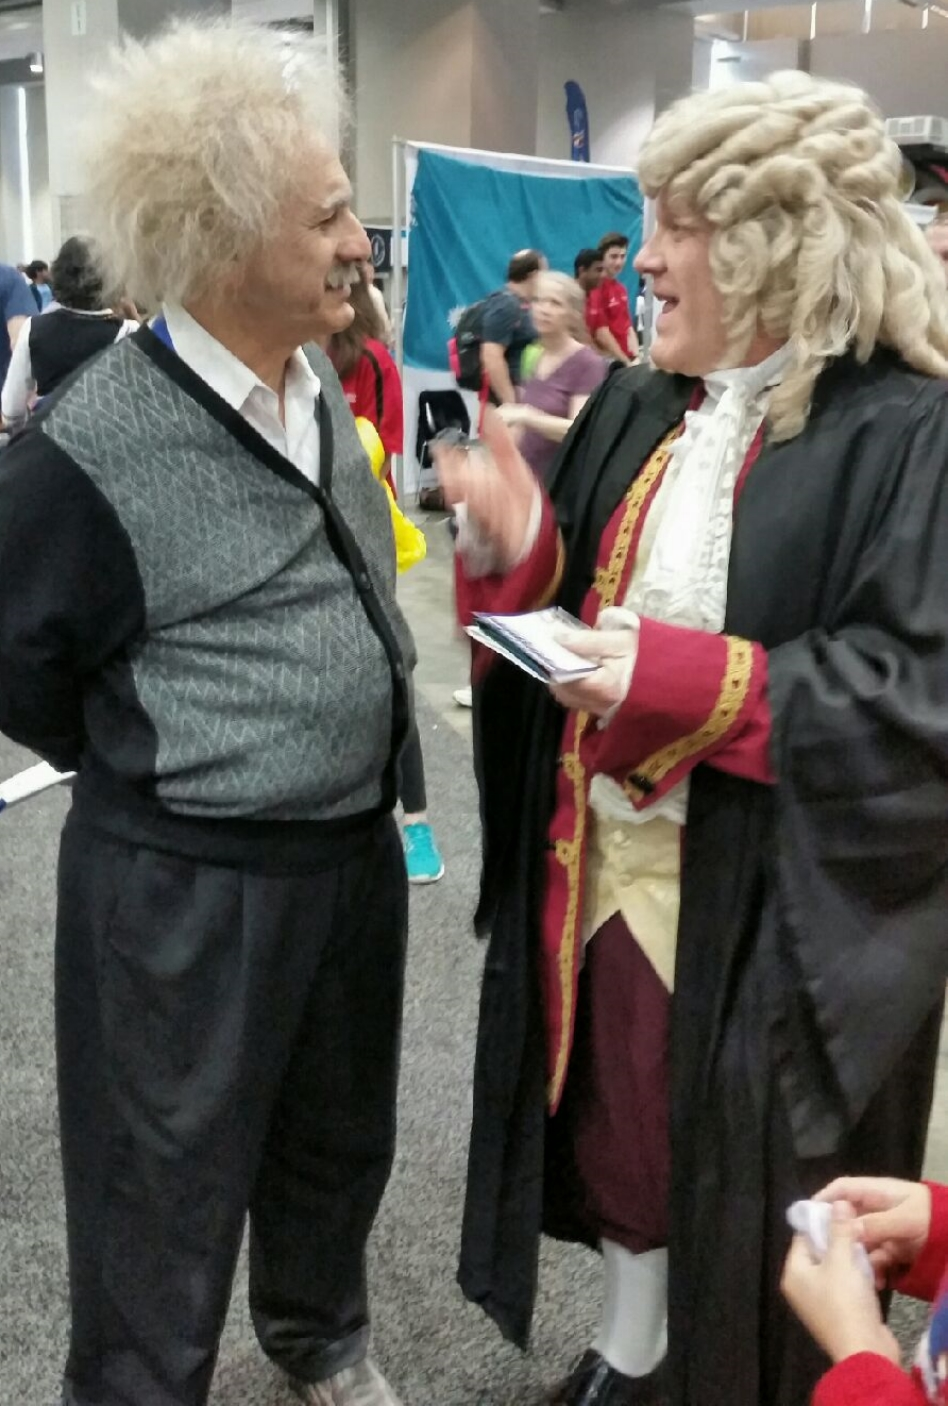 2016-04-17 109 Newton.jpg